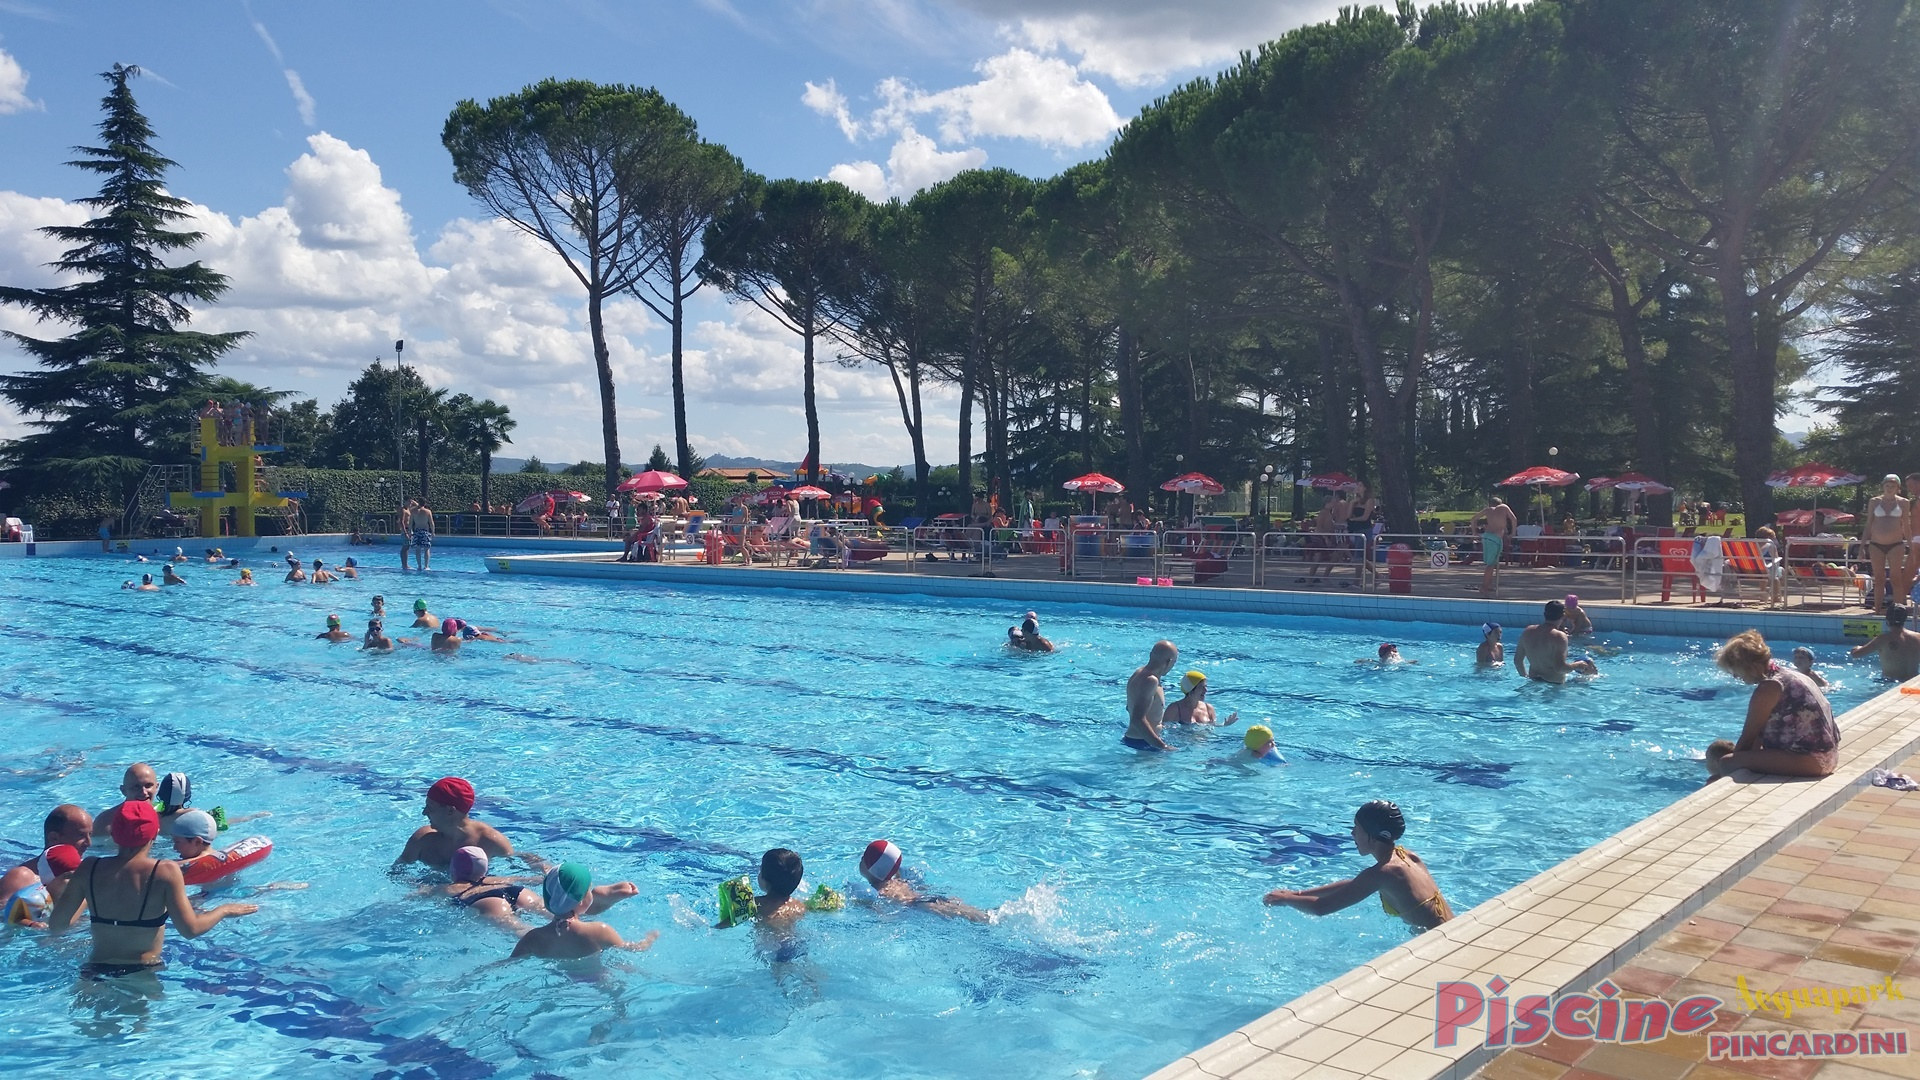 Attrazioni acquapark pincardini - Dimensioni piscina olimpionica ...